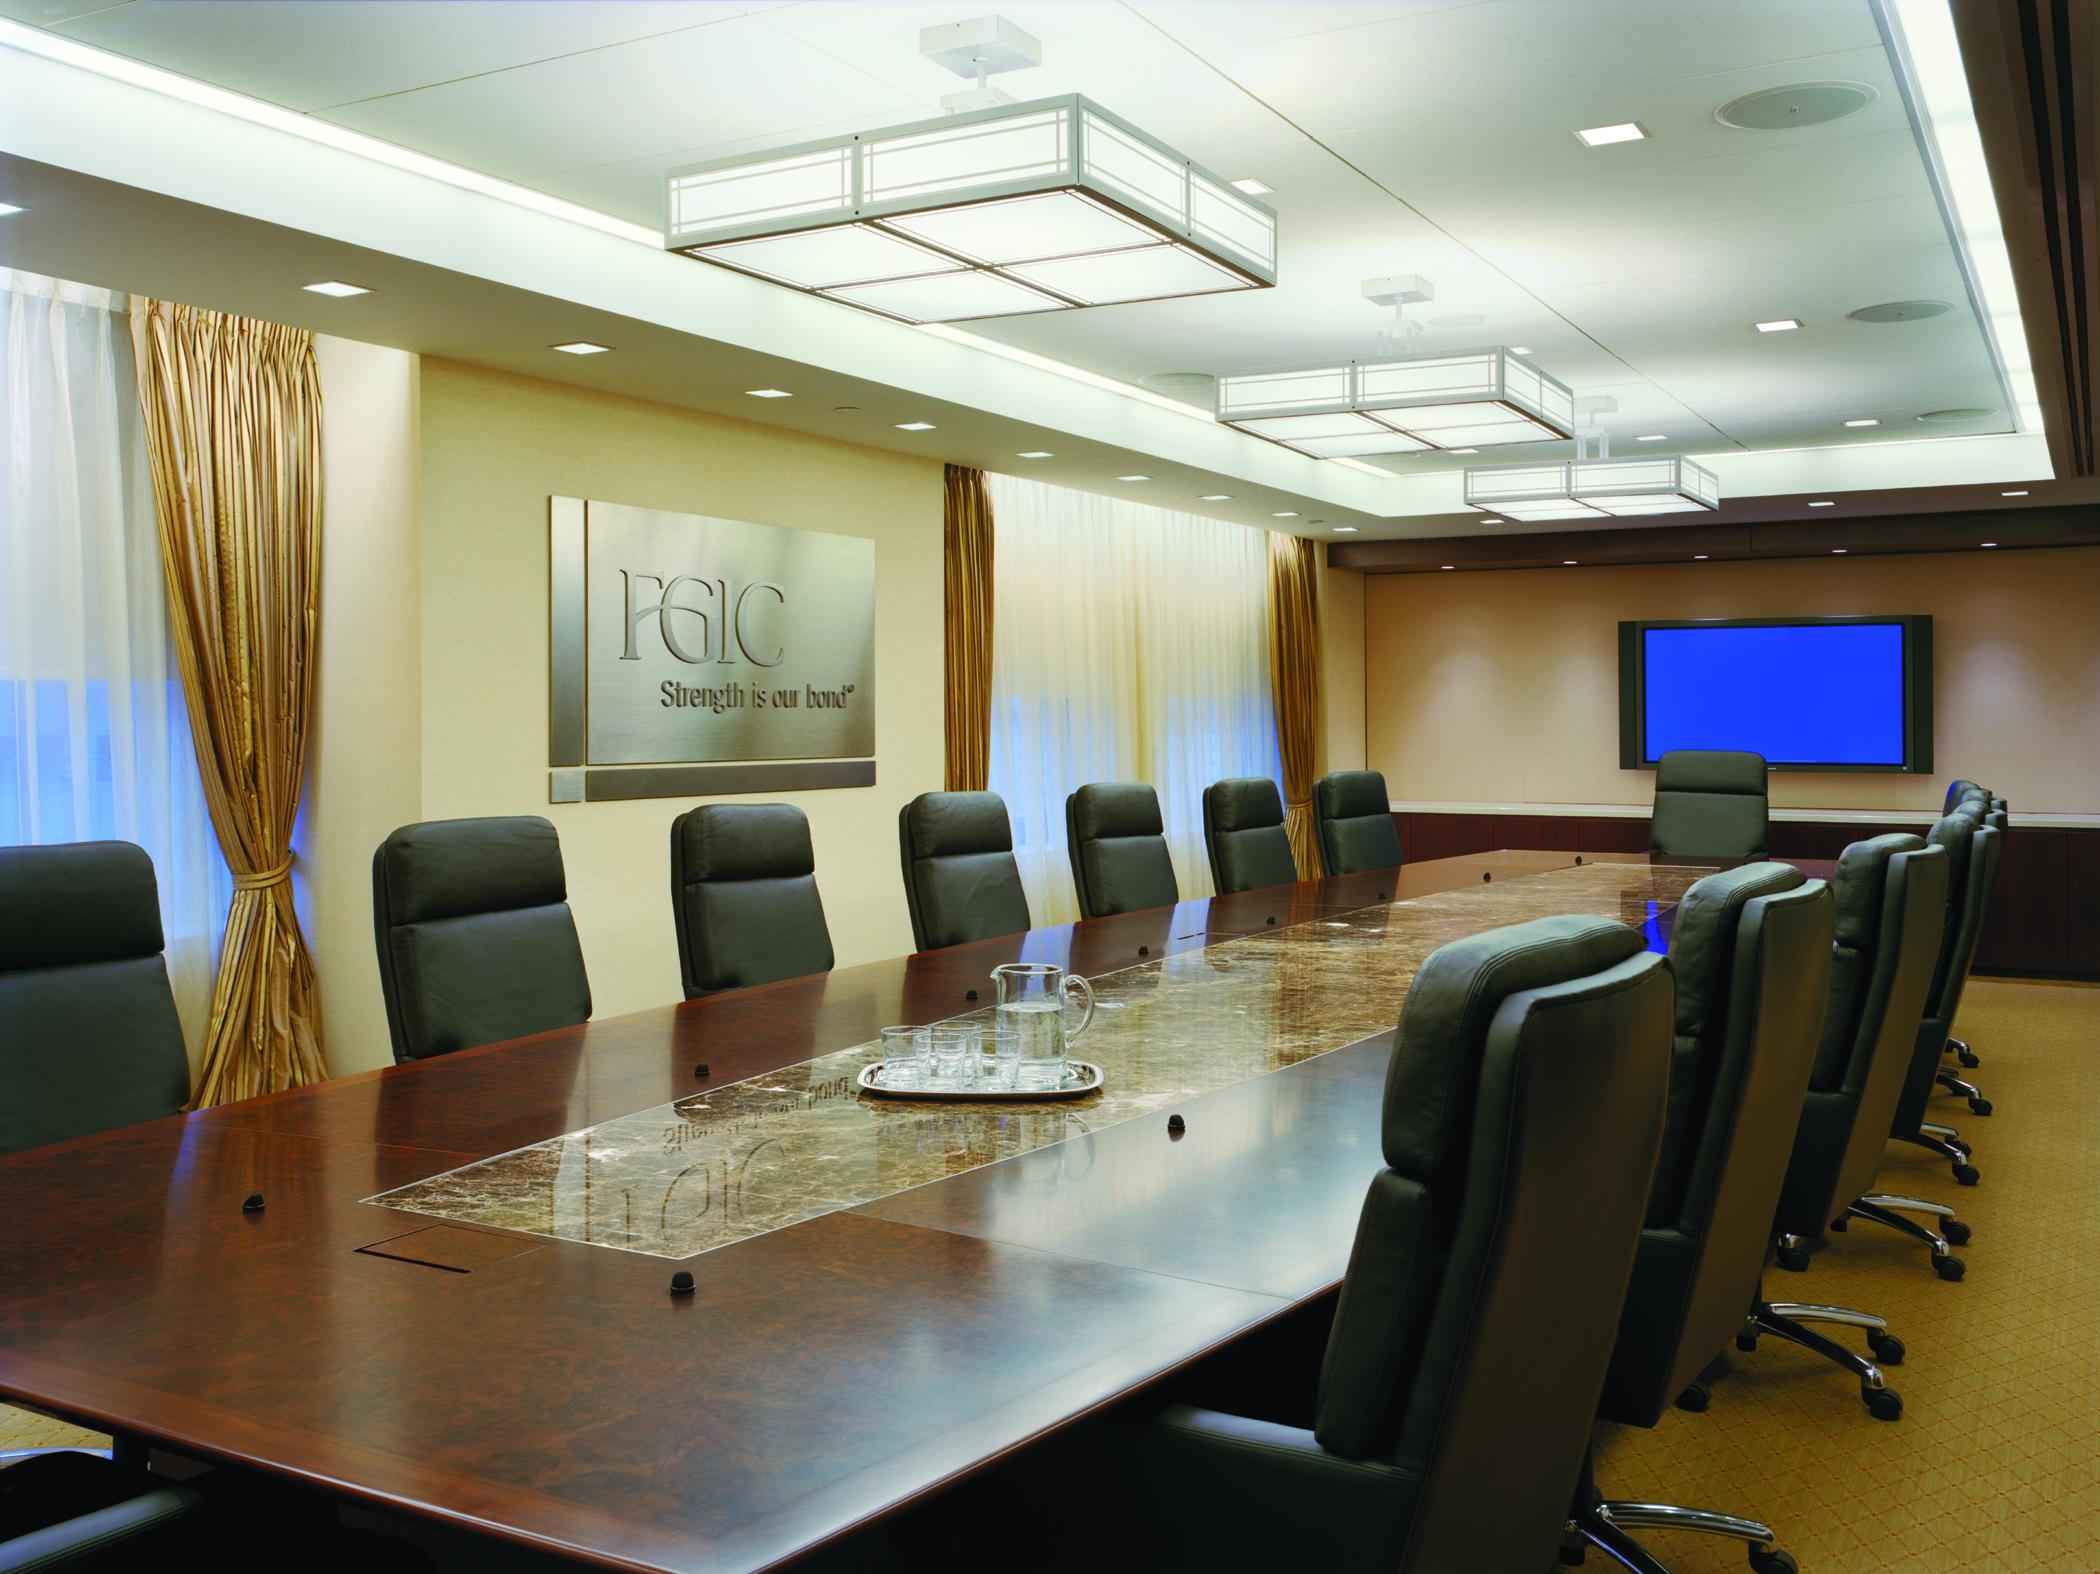 9008 FGIC_Conference Room-1.jpg